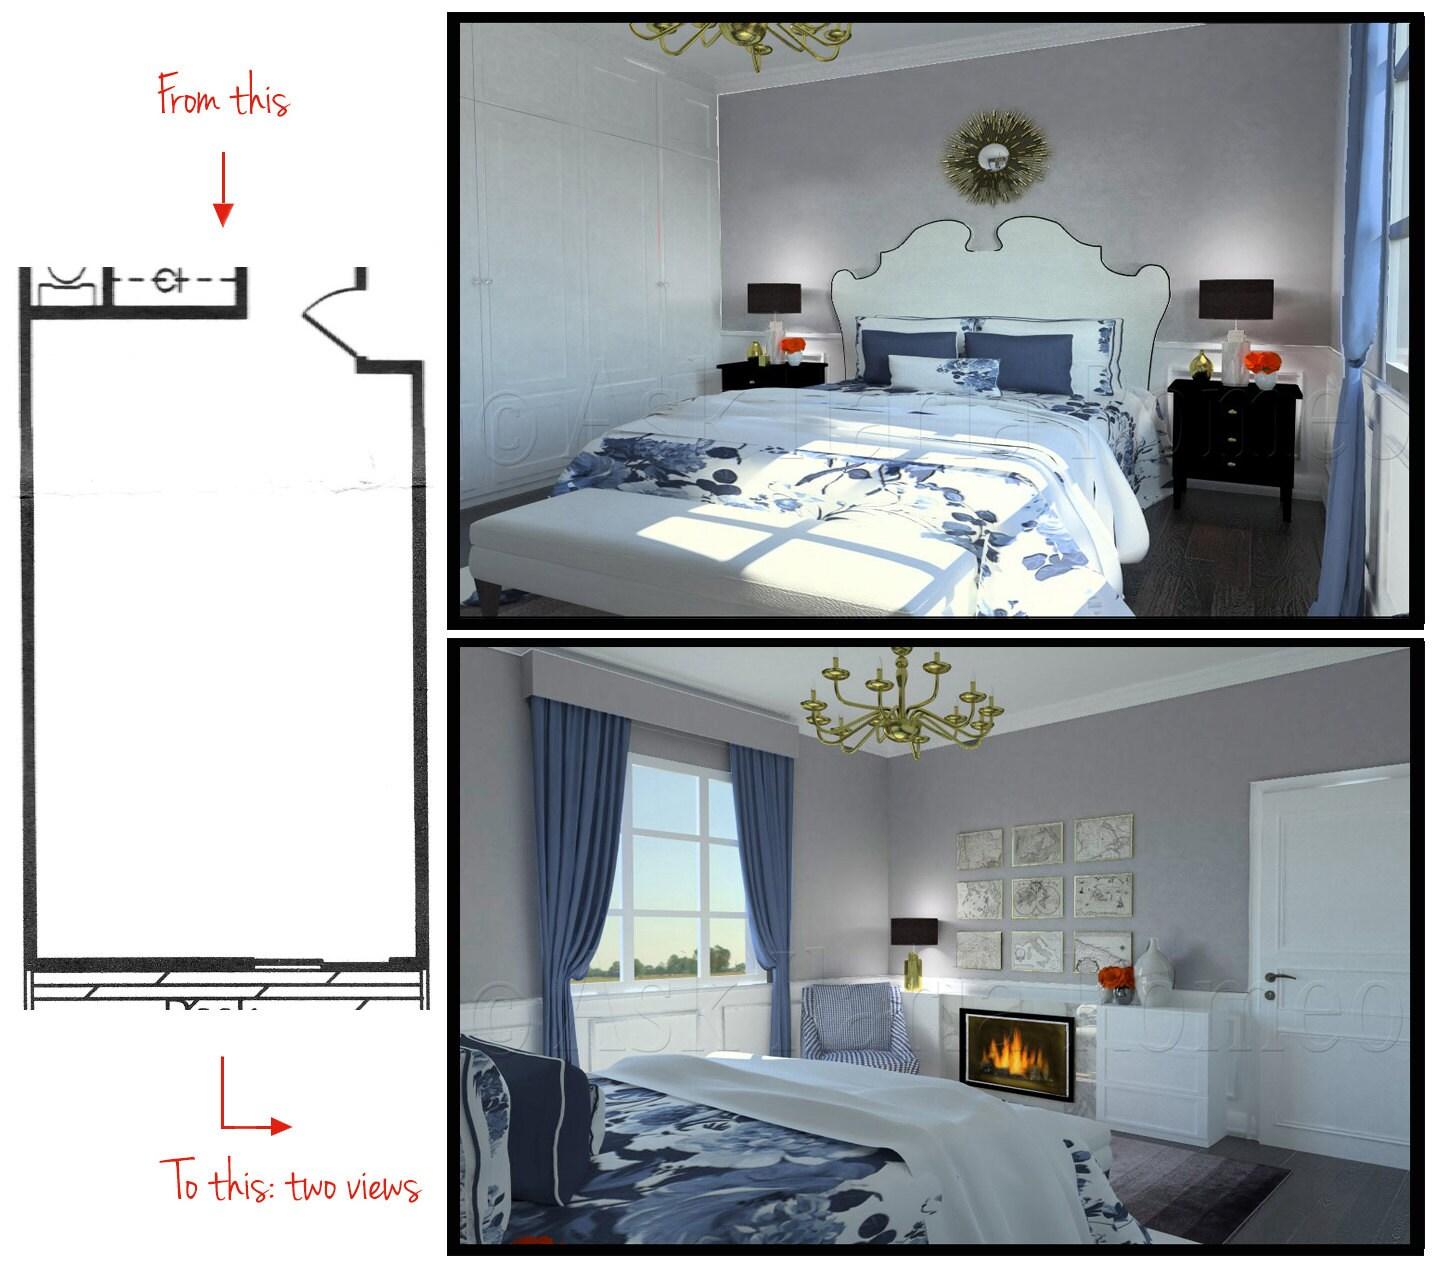 Bedroom Furniture Not Matching Bedroom Interior Quotes Bedroom Bed Back Wall Bedroom Design Board: Bedroom 2 Views Rendering Interior Design Custom Furniture